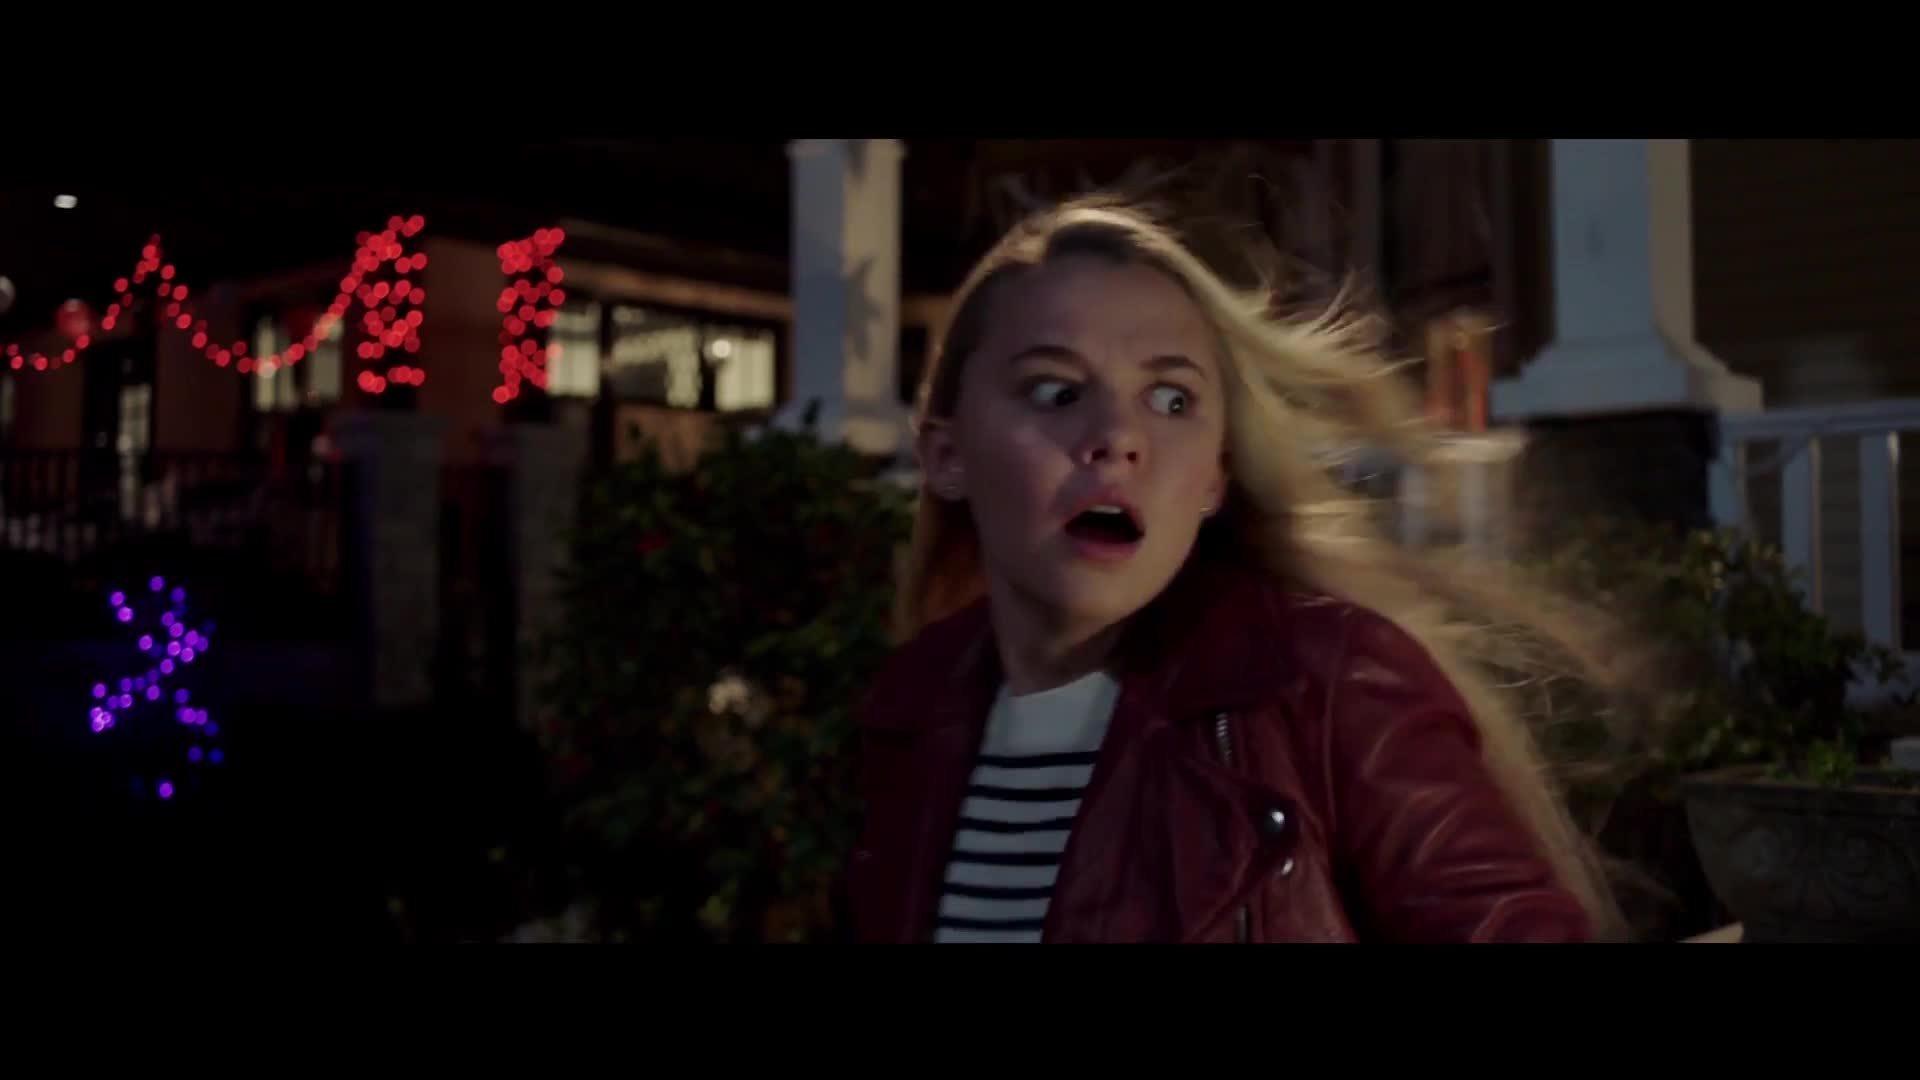 Trailer Goosebumps 2: Haunted Halloween (Câu chuyện lúc nửa đêm 2: Halloween quỷ ám)